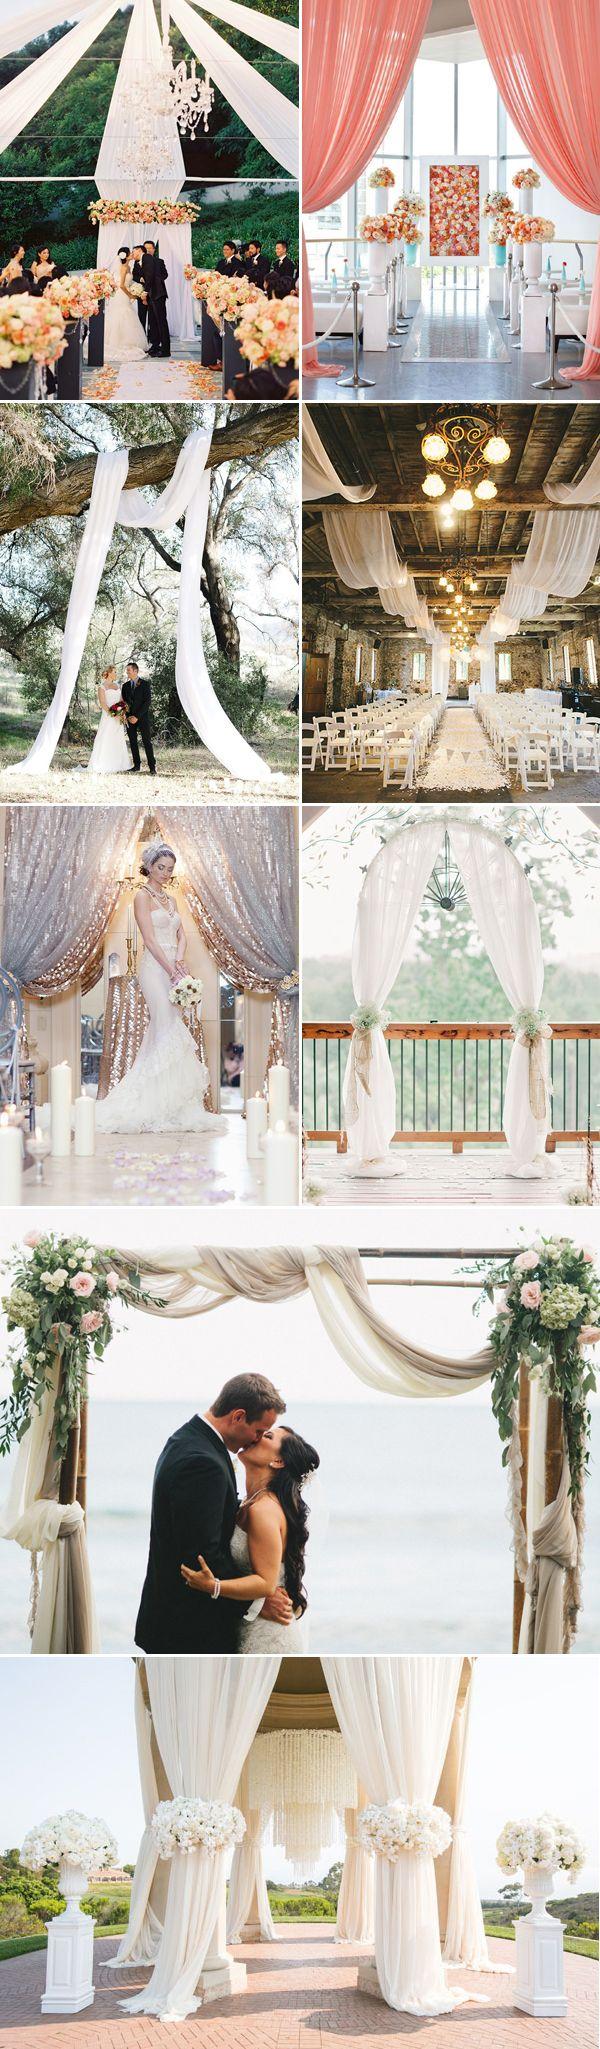 18 best wedding backdrop images on Pinterest | Wedding ideas, Flower ...